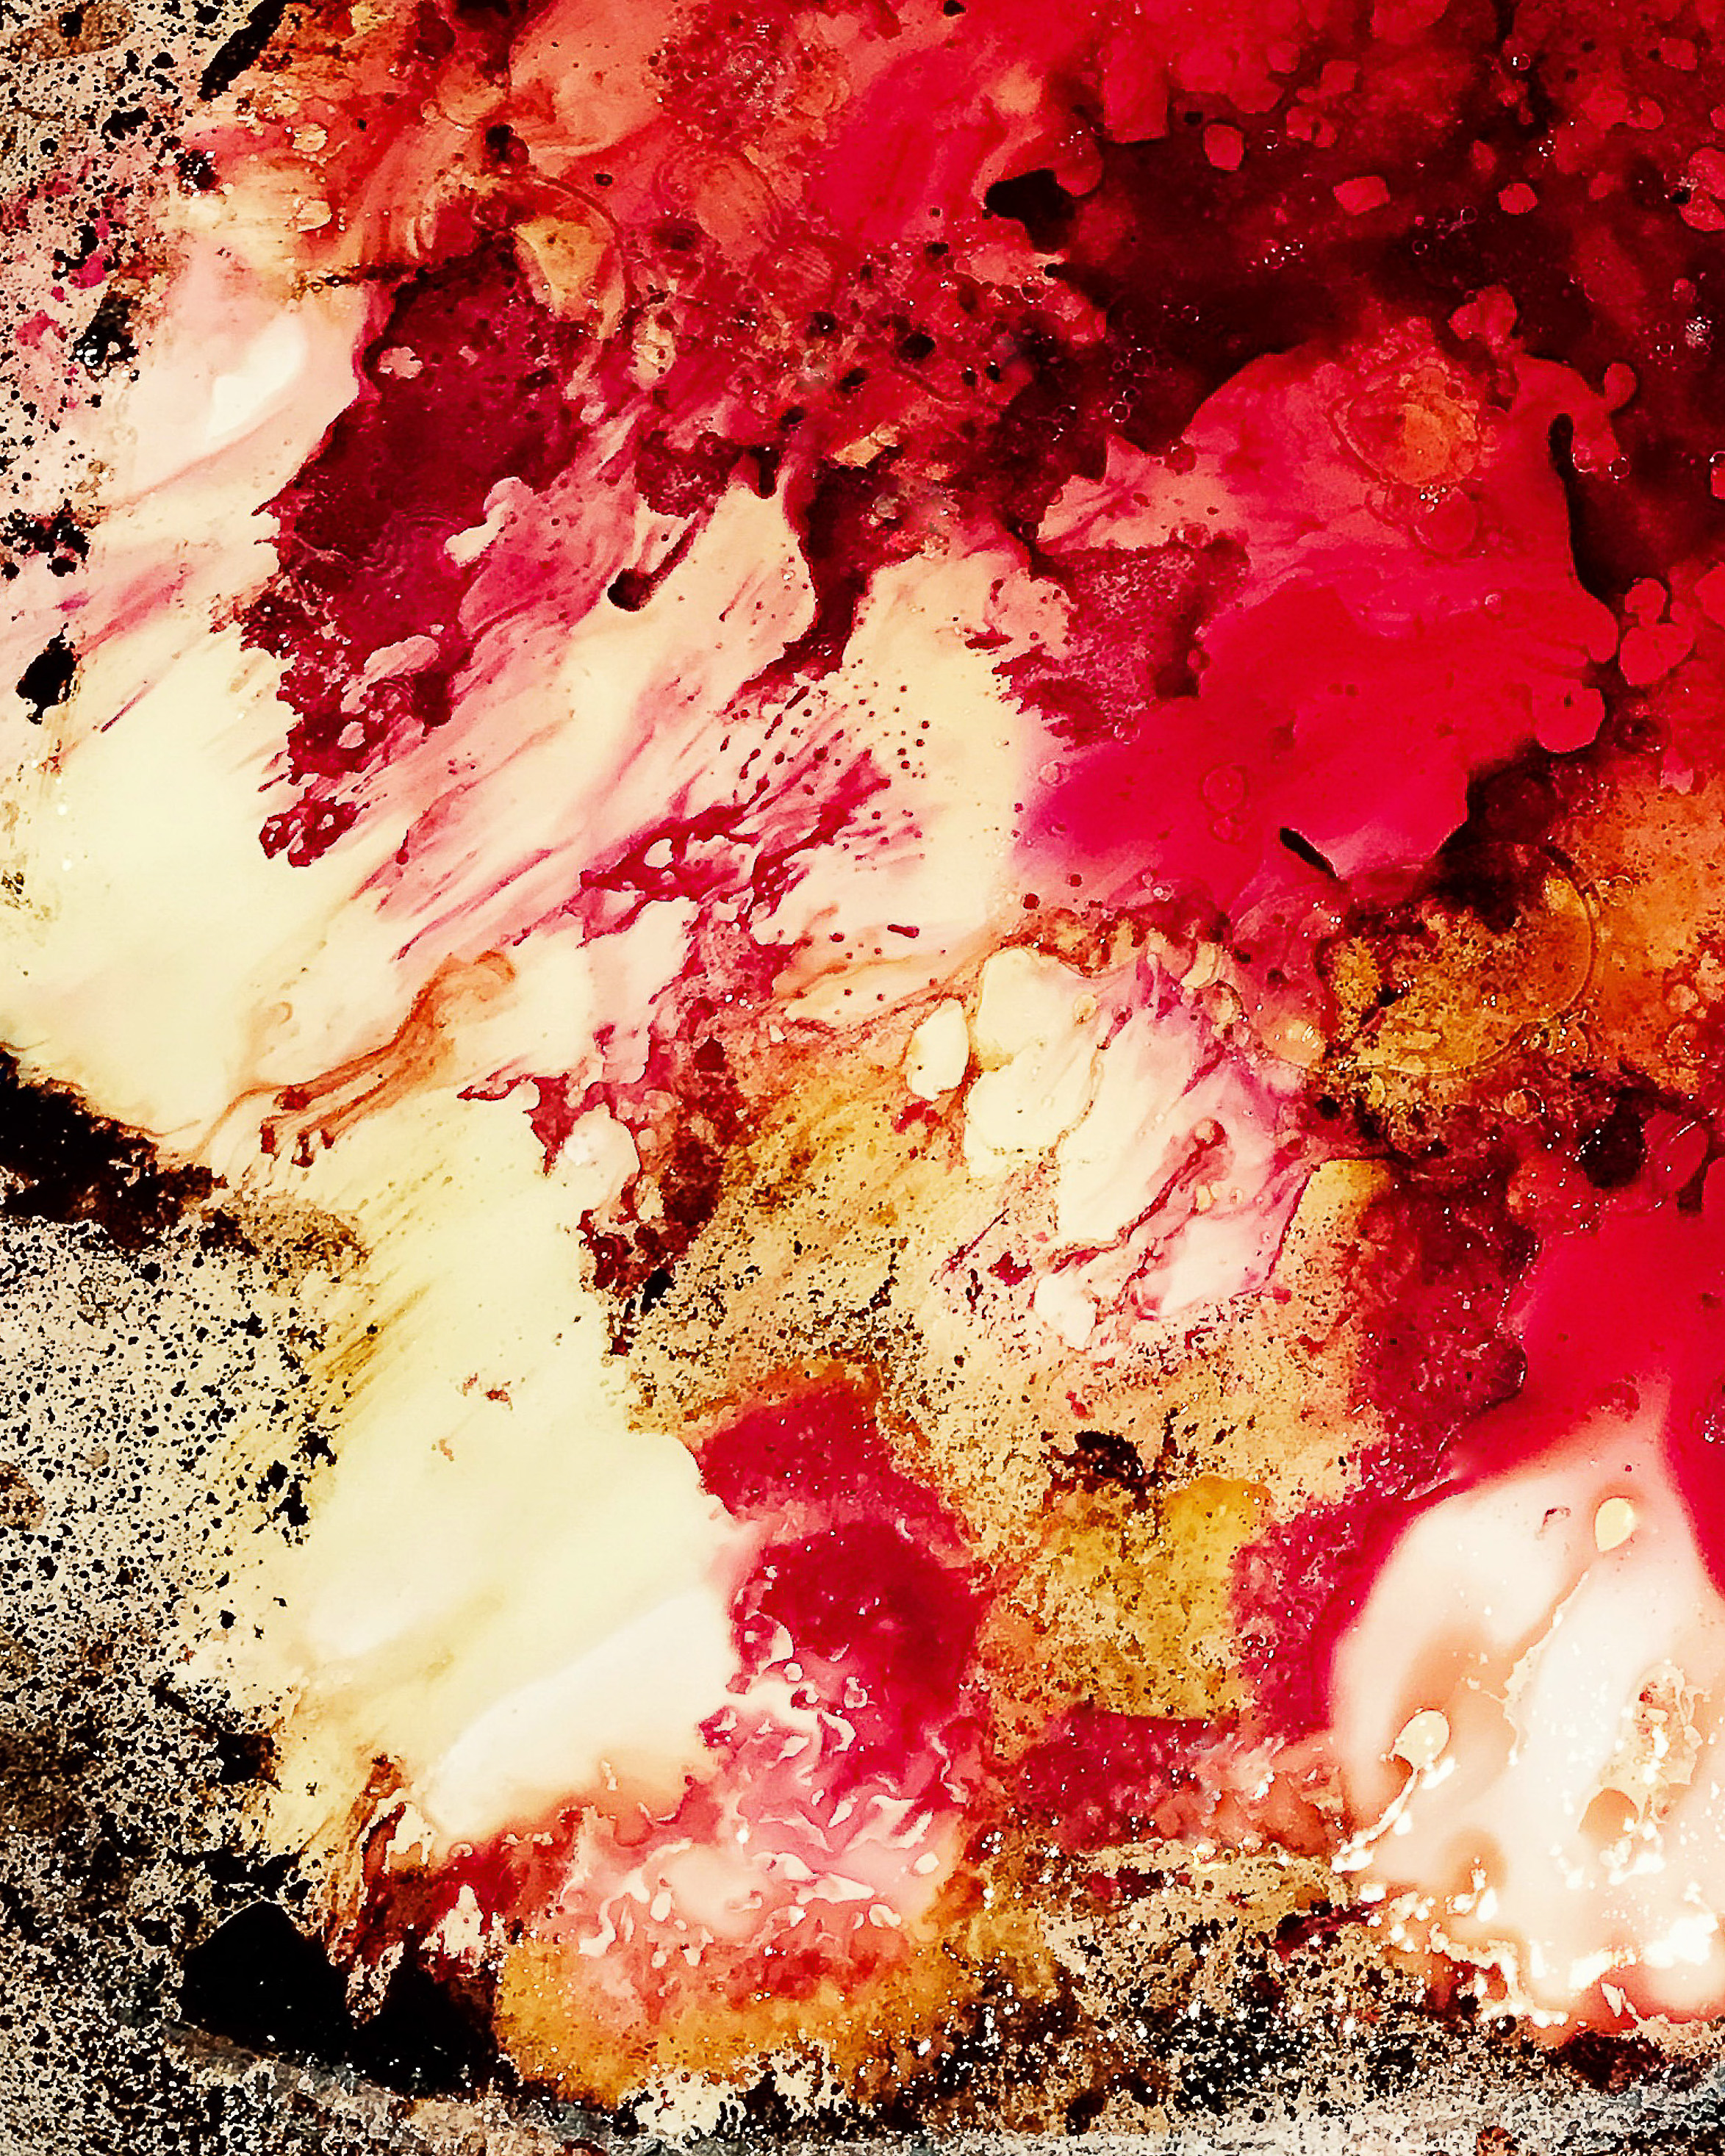 Untitled (Eruption)